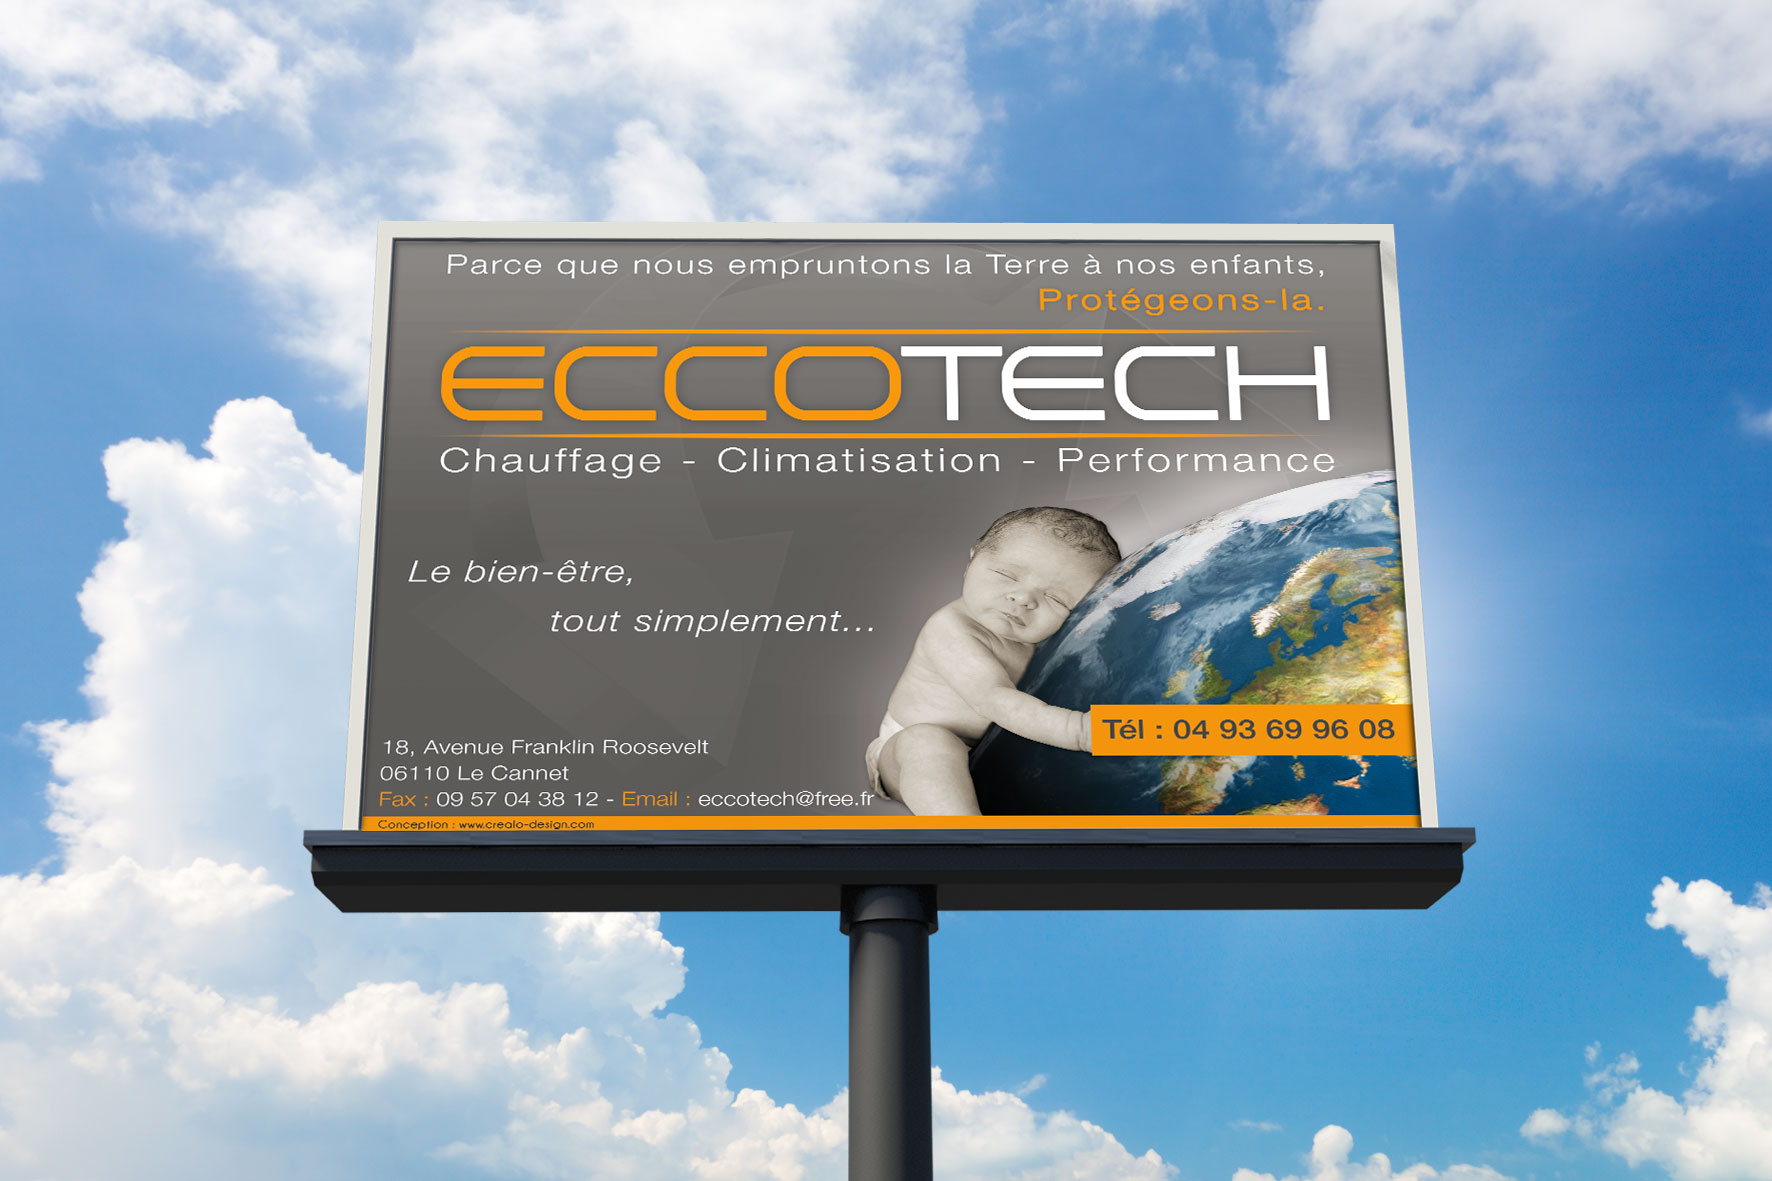 Eccotech